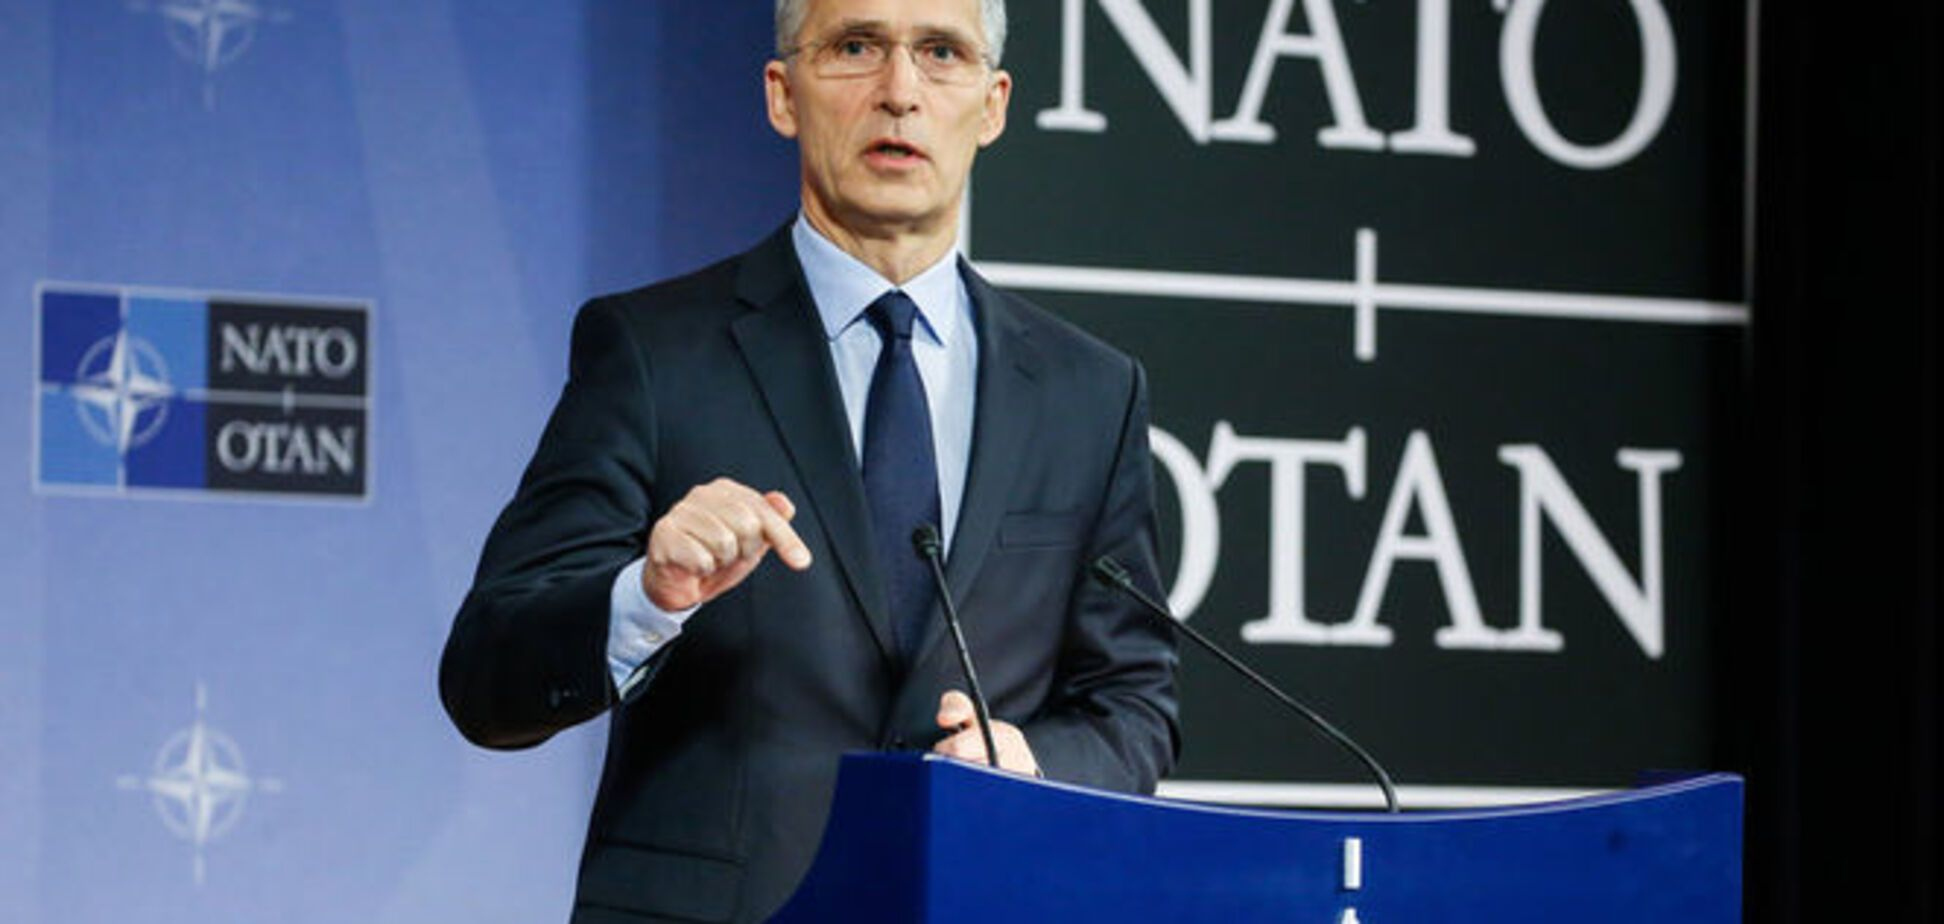 'Крымский сценарий' в Европе: в НАТО расставили точки над 'і'